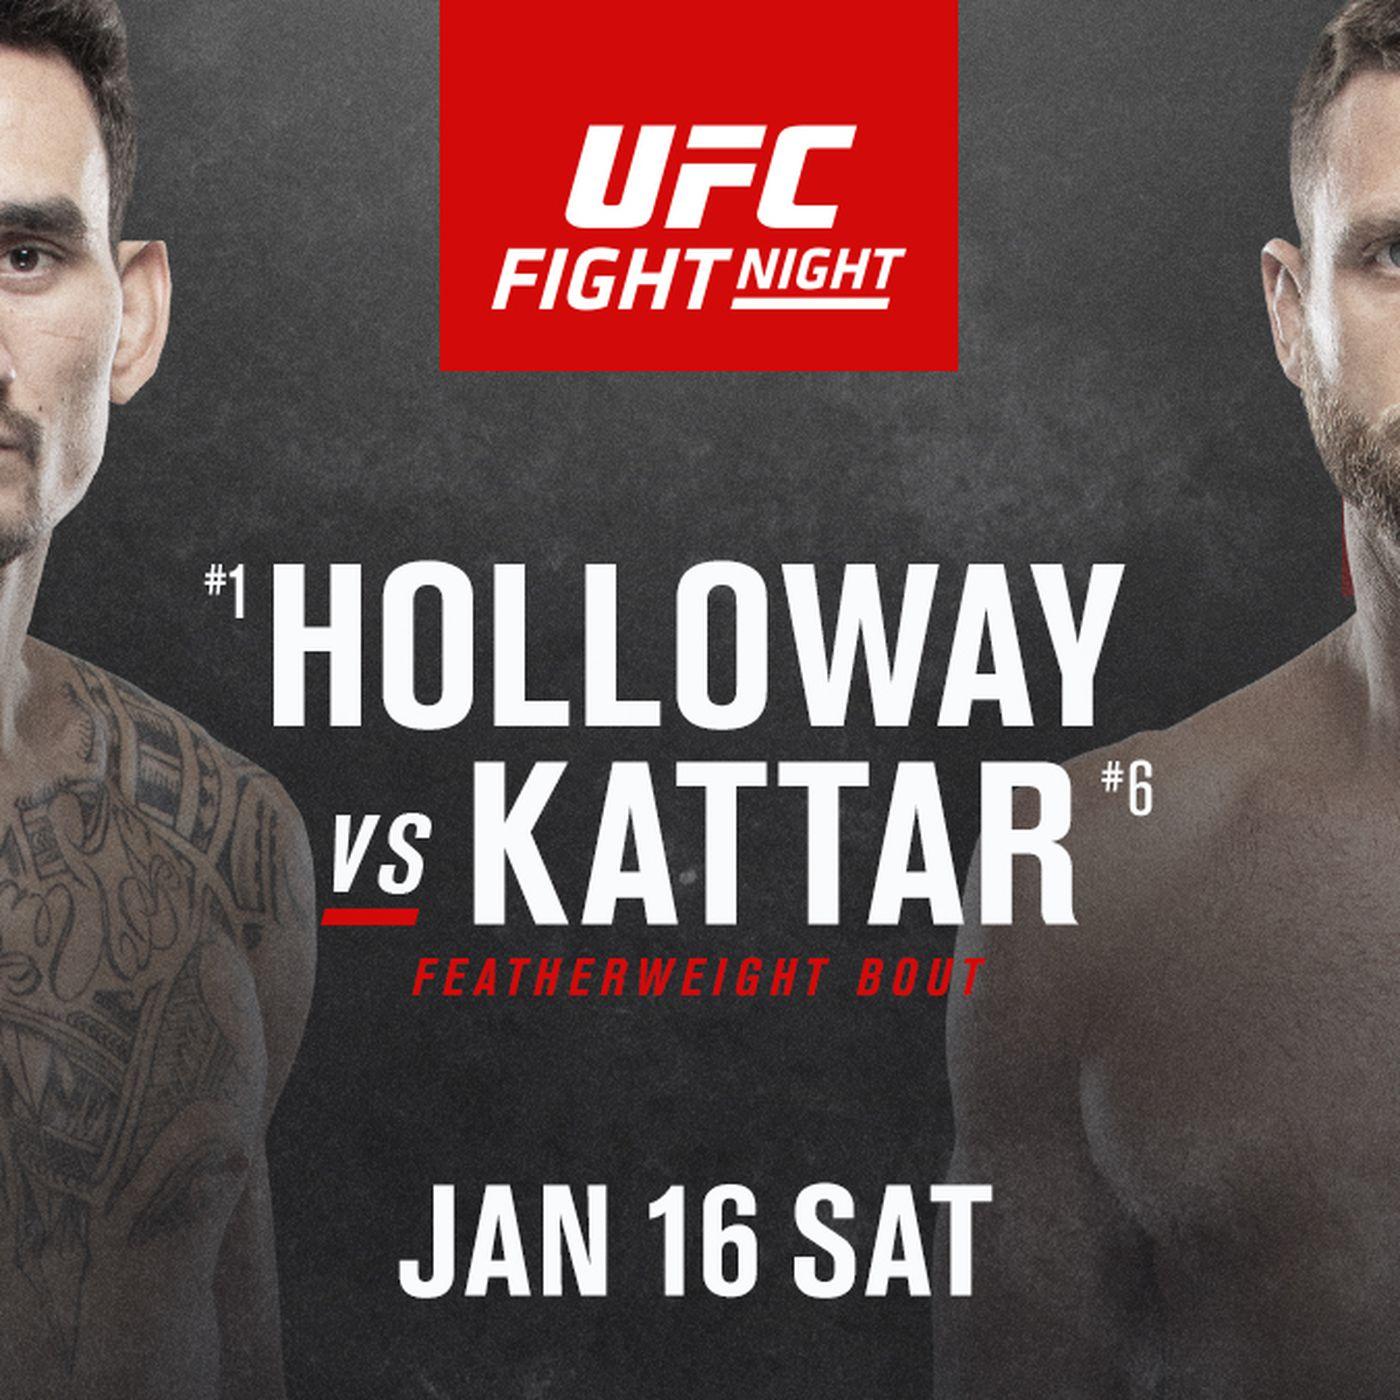 Latest Ufc Fight Island 7 Fight Card On Abc Espn Lineup For Holloway Vs Kattar On Jan 16 Mmamania Com